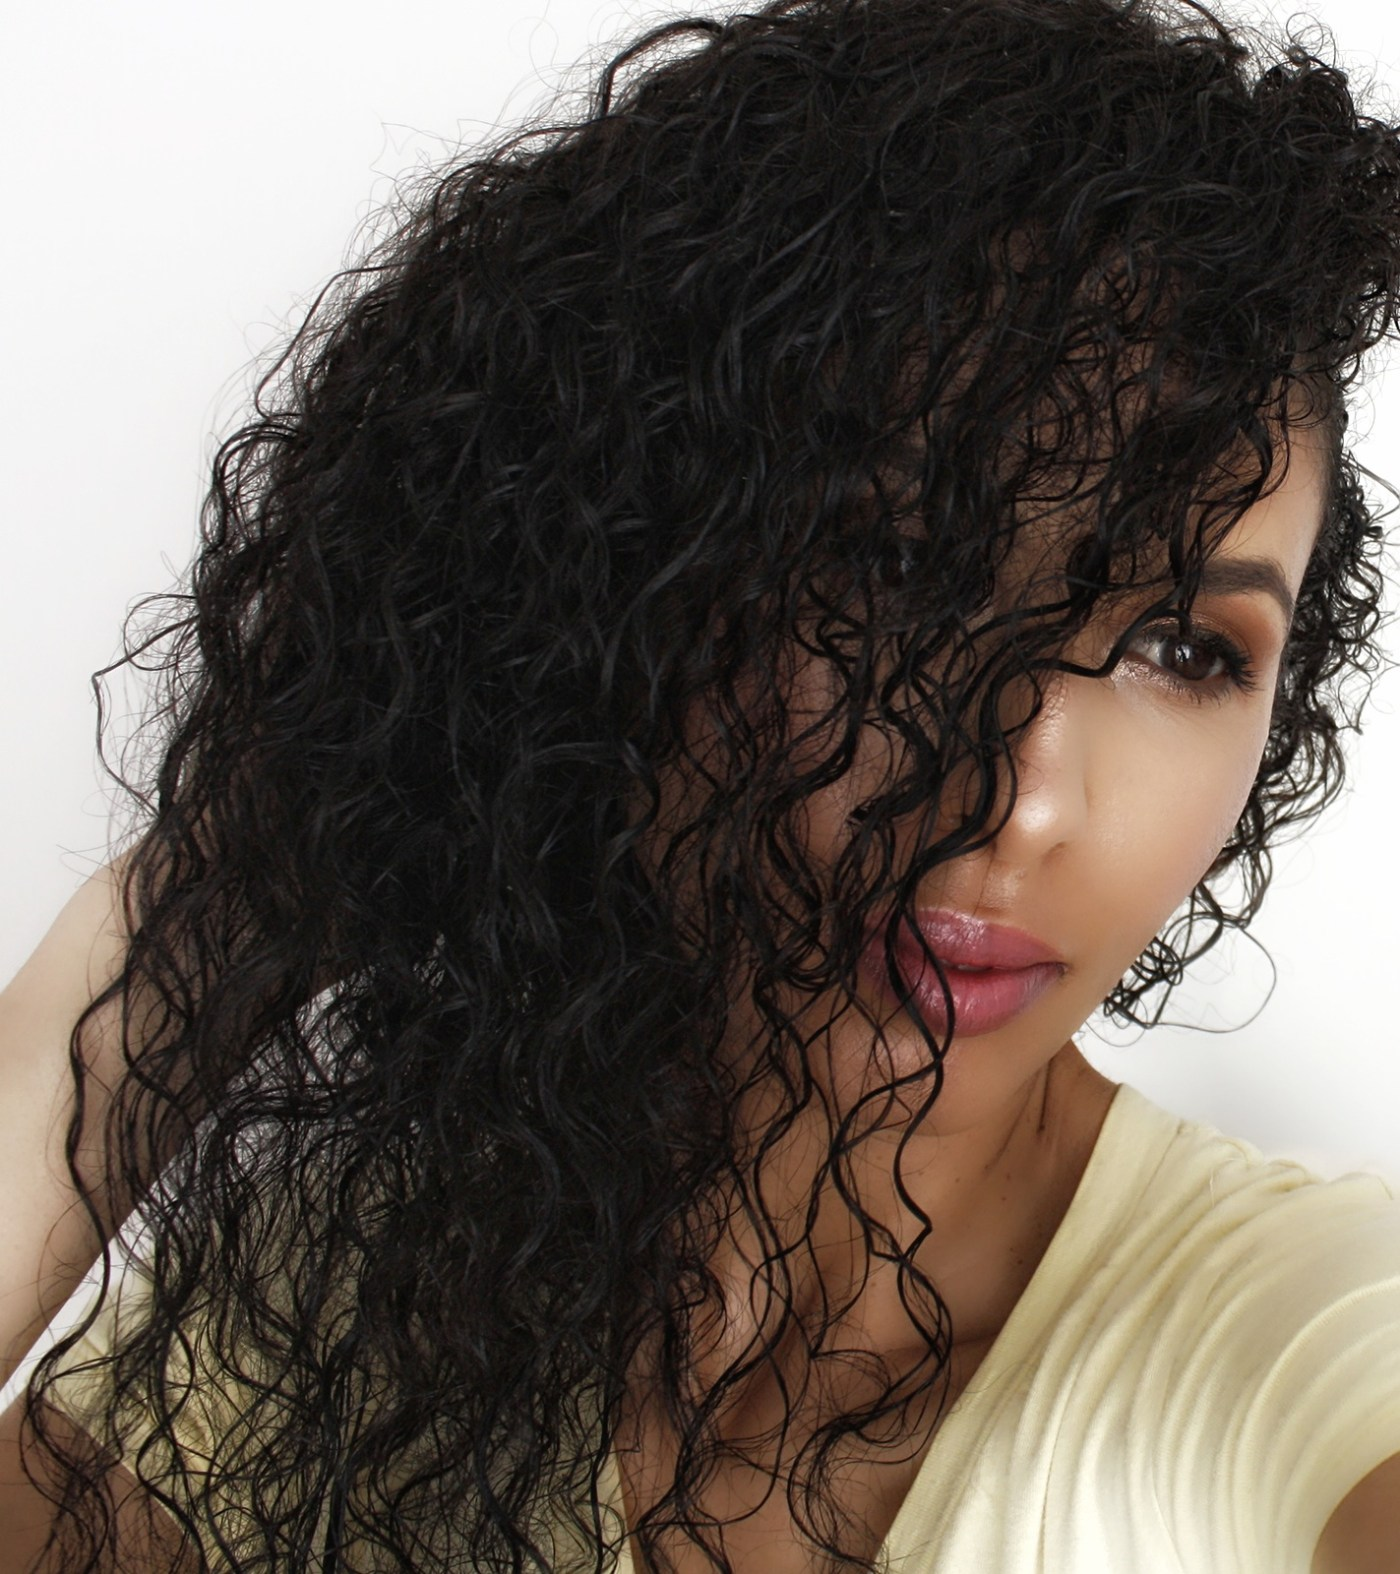 3 DIY HAIR MASKS FOR NATURAL HAIR